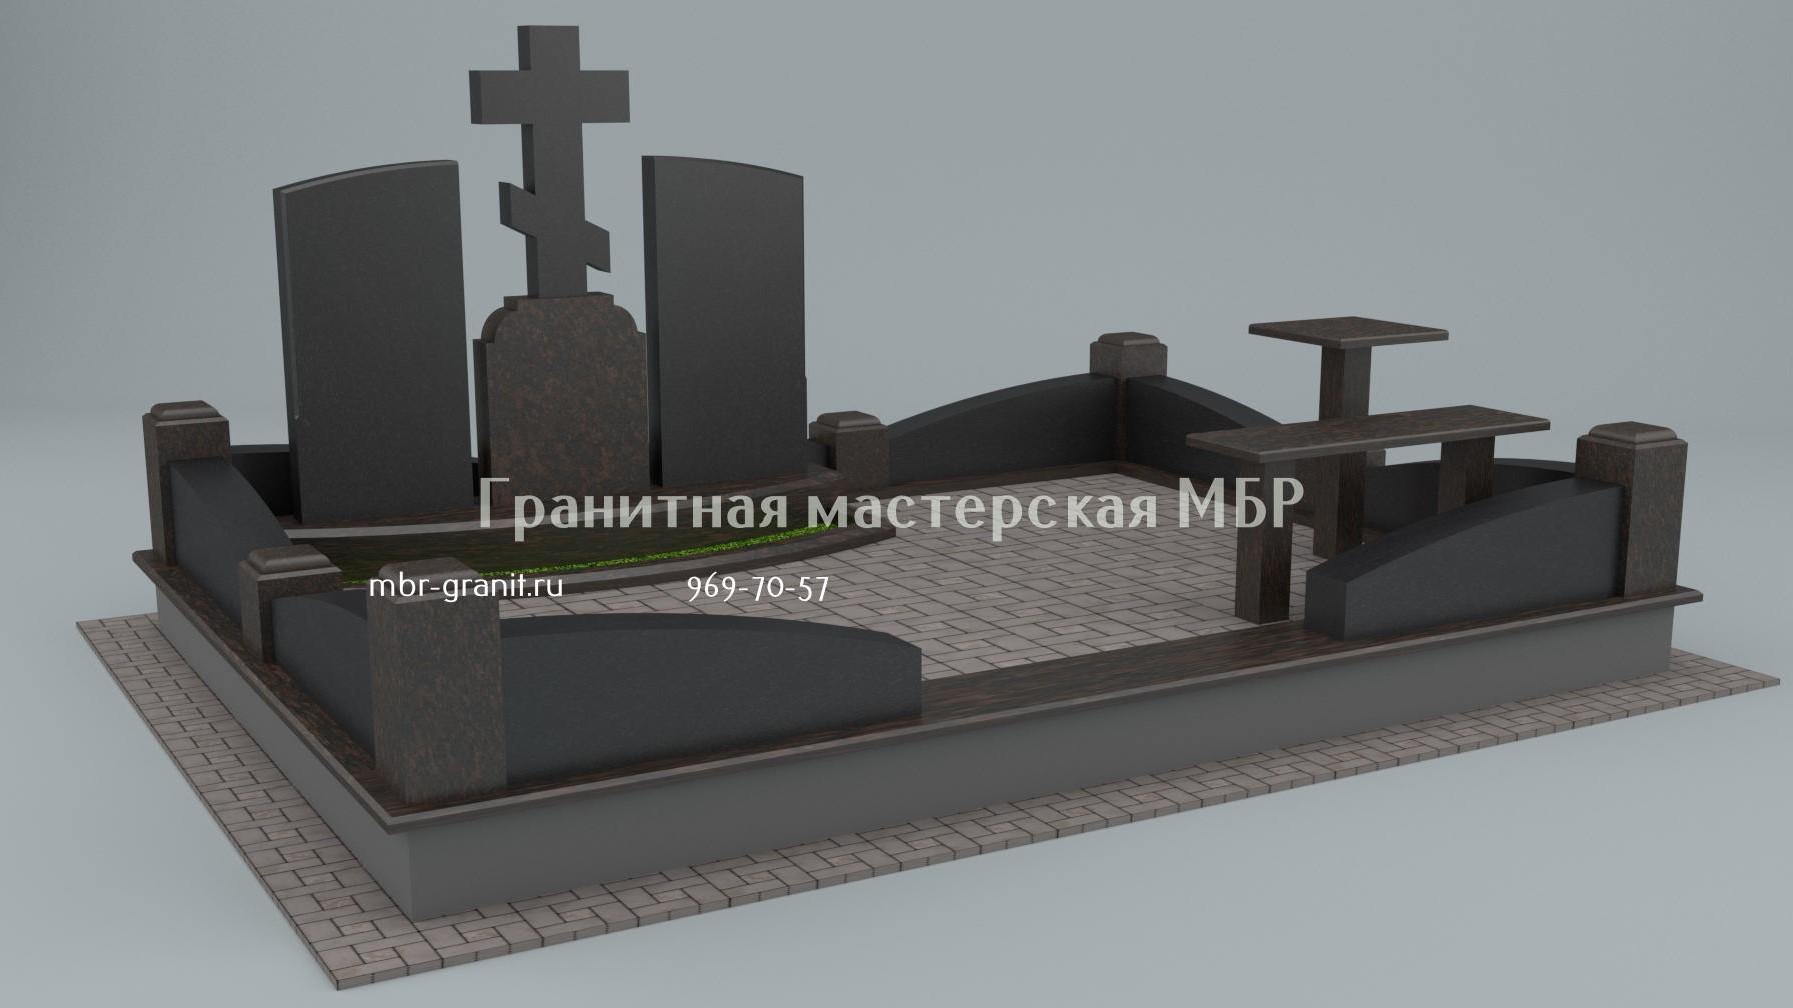 Изготовление памятников в спб с 01 01 в цена на памятники в омске фото